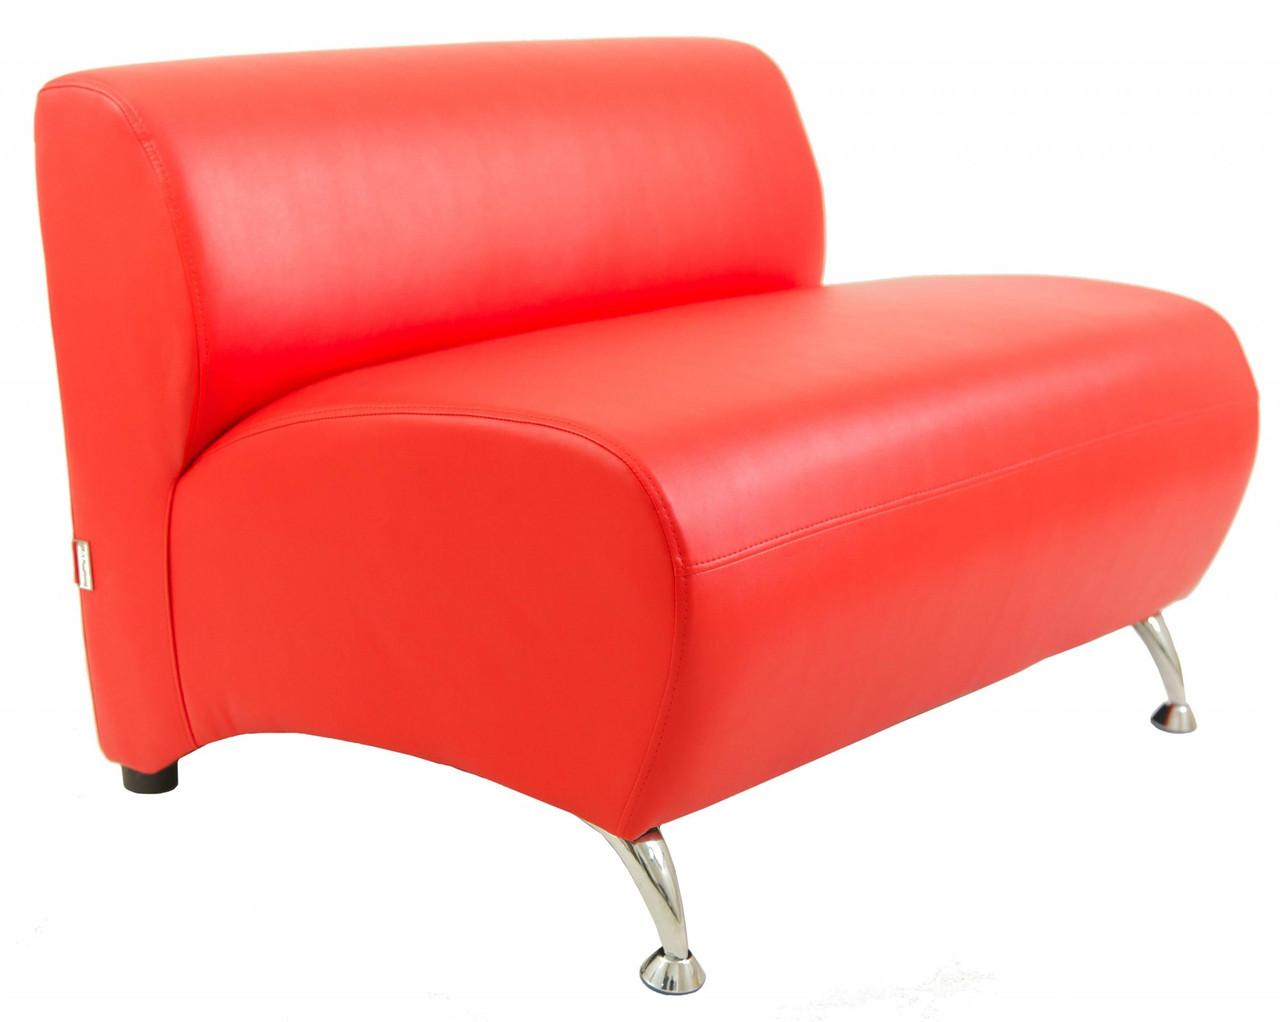 Кресло Richman Флорида 780 x 700 x 680H см Boom 16 (Флай 2210) Красное